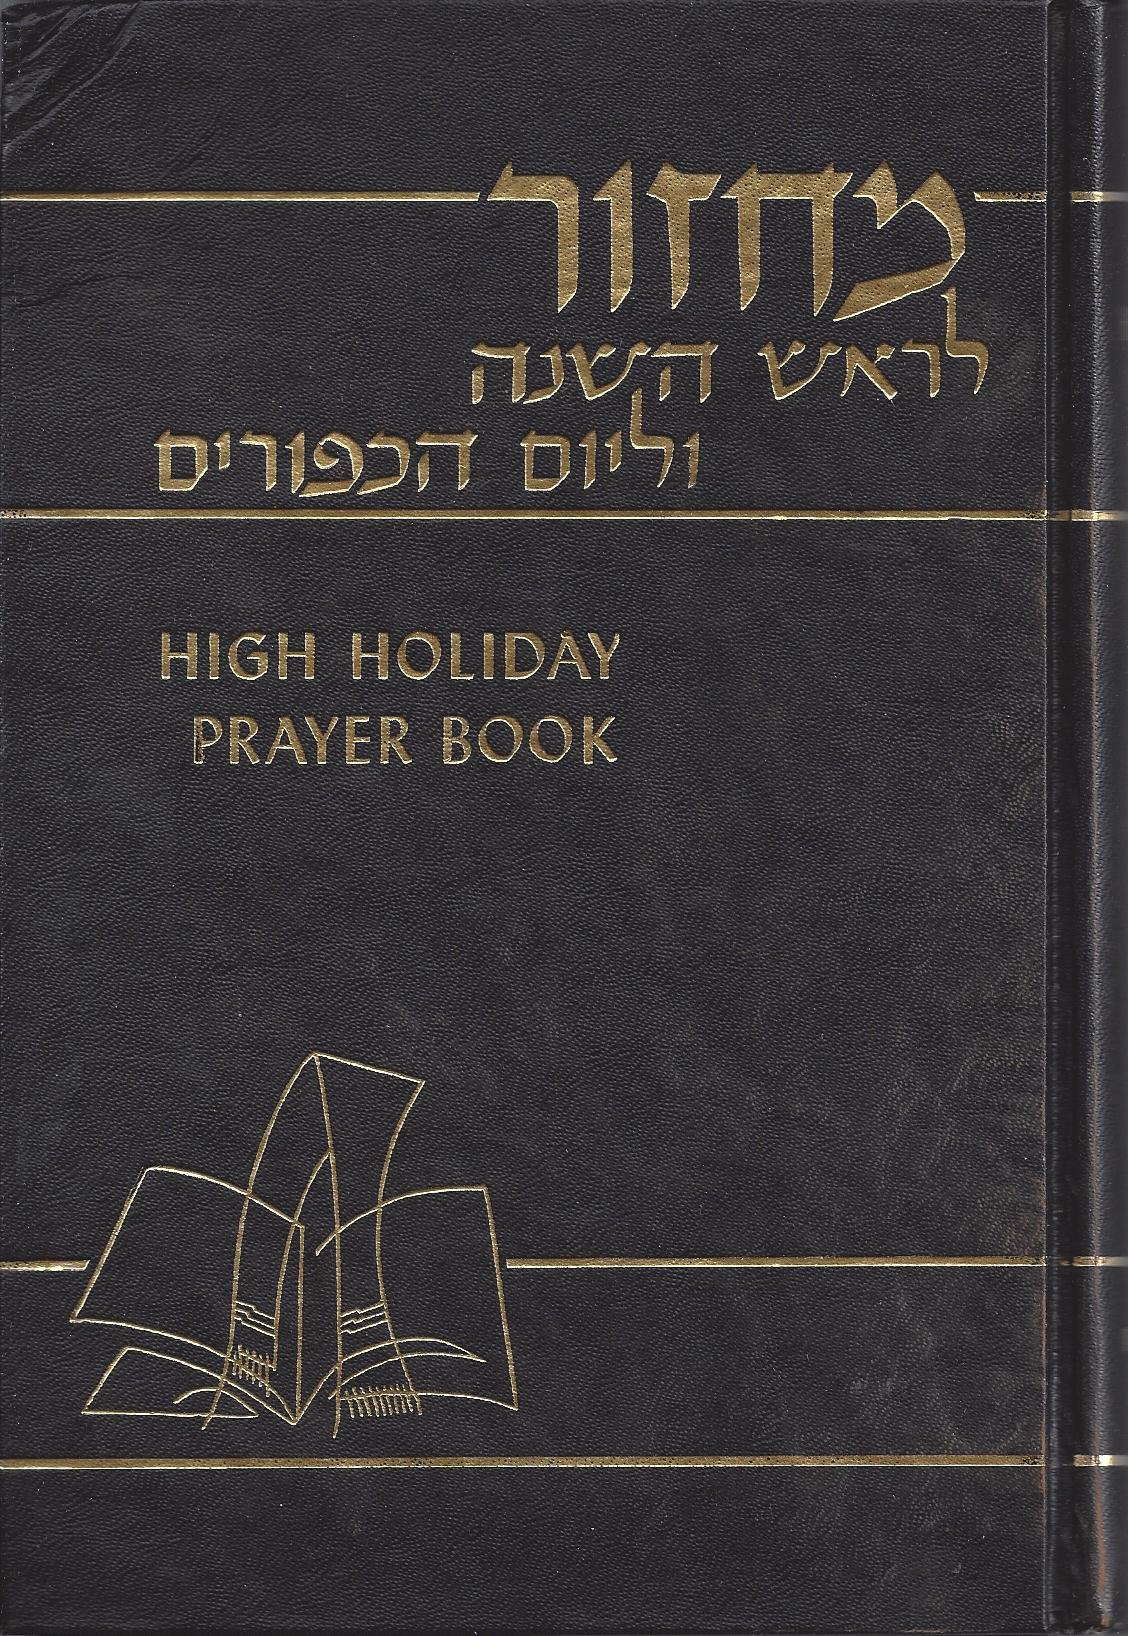 High Holiday Prayer Book